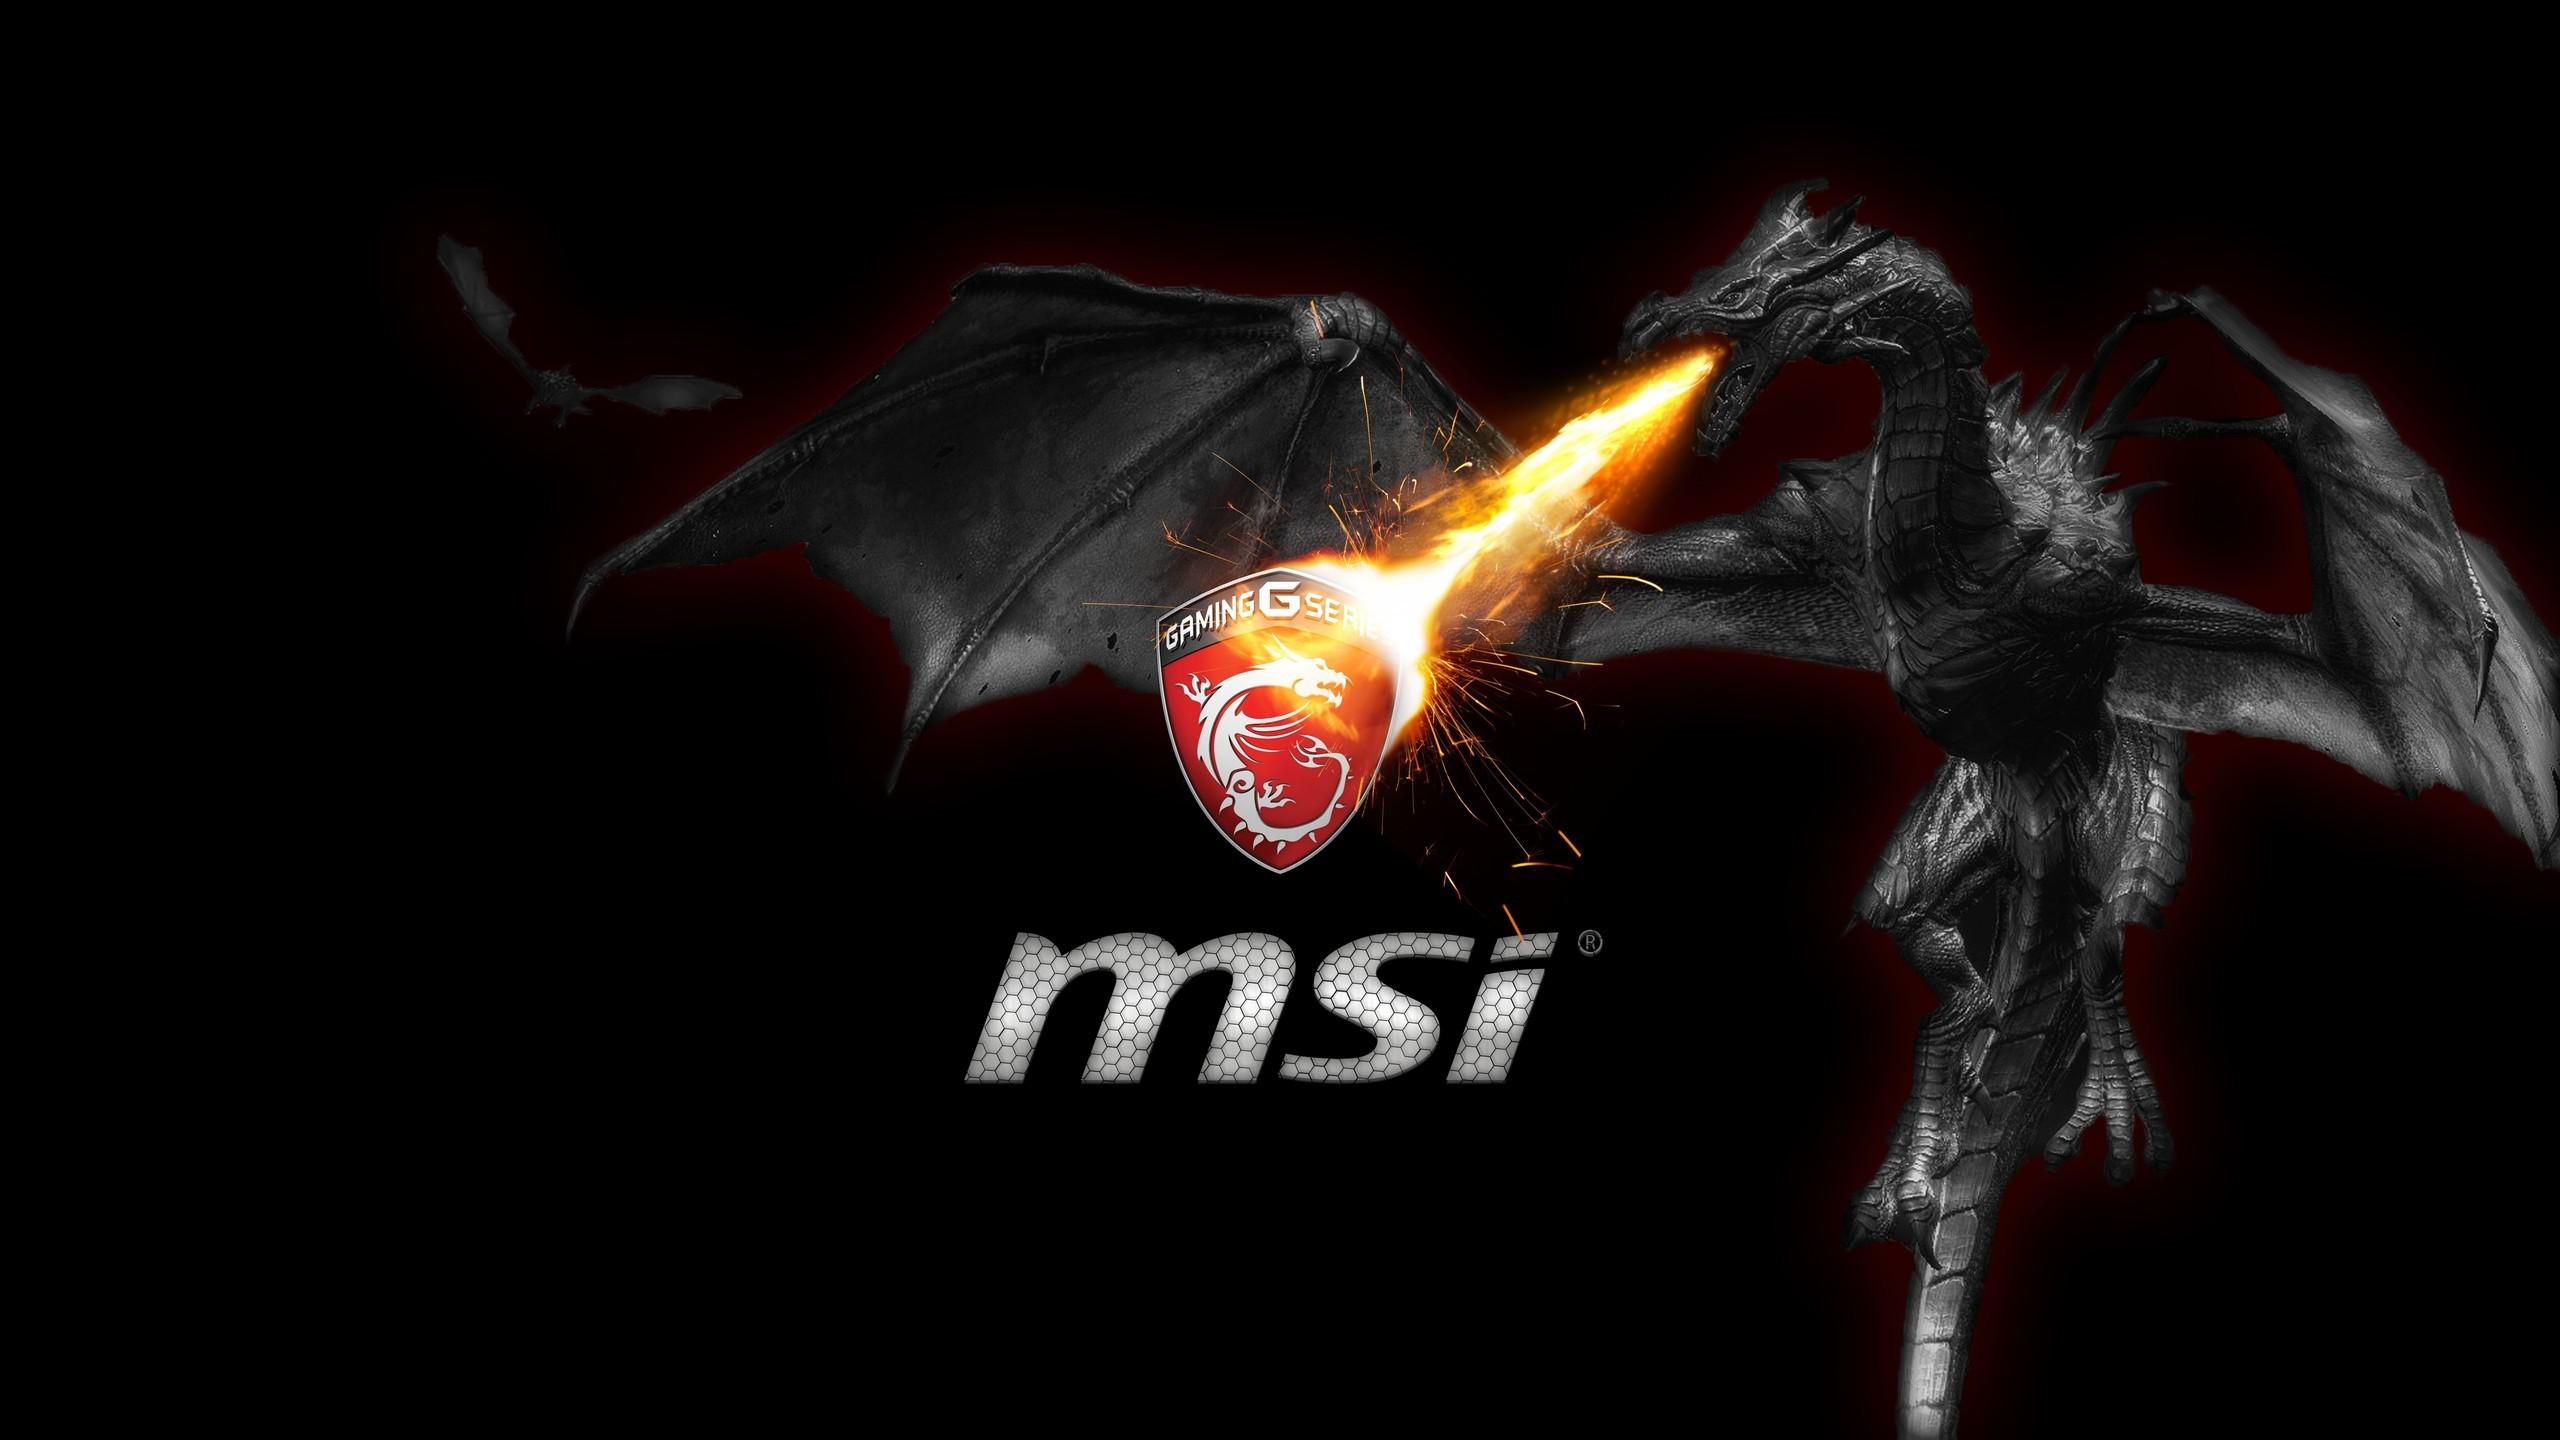 Download MSI HD 4k Wallpapers In Screen Resolution